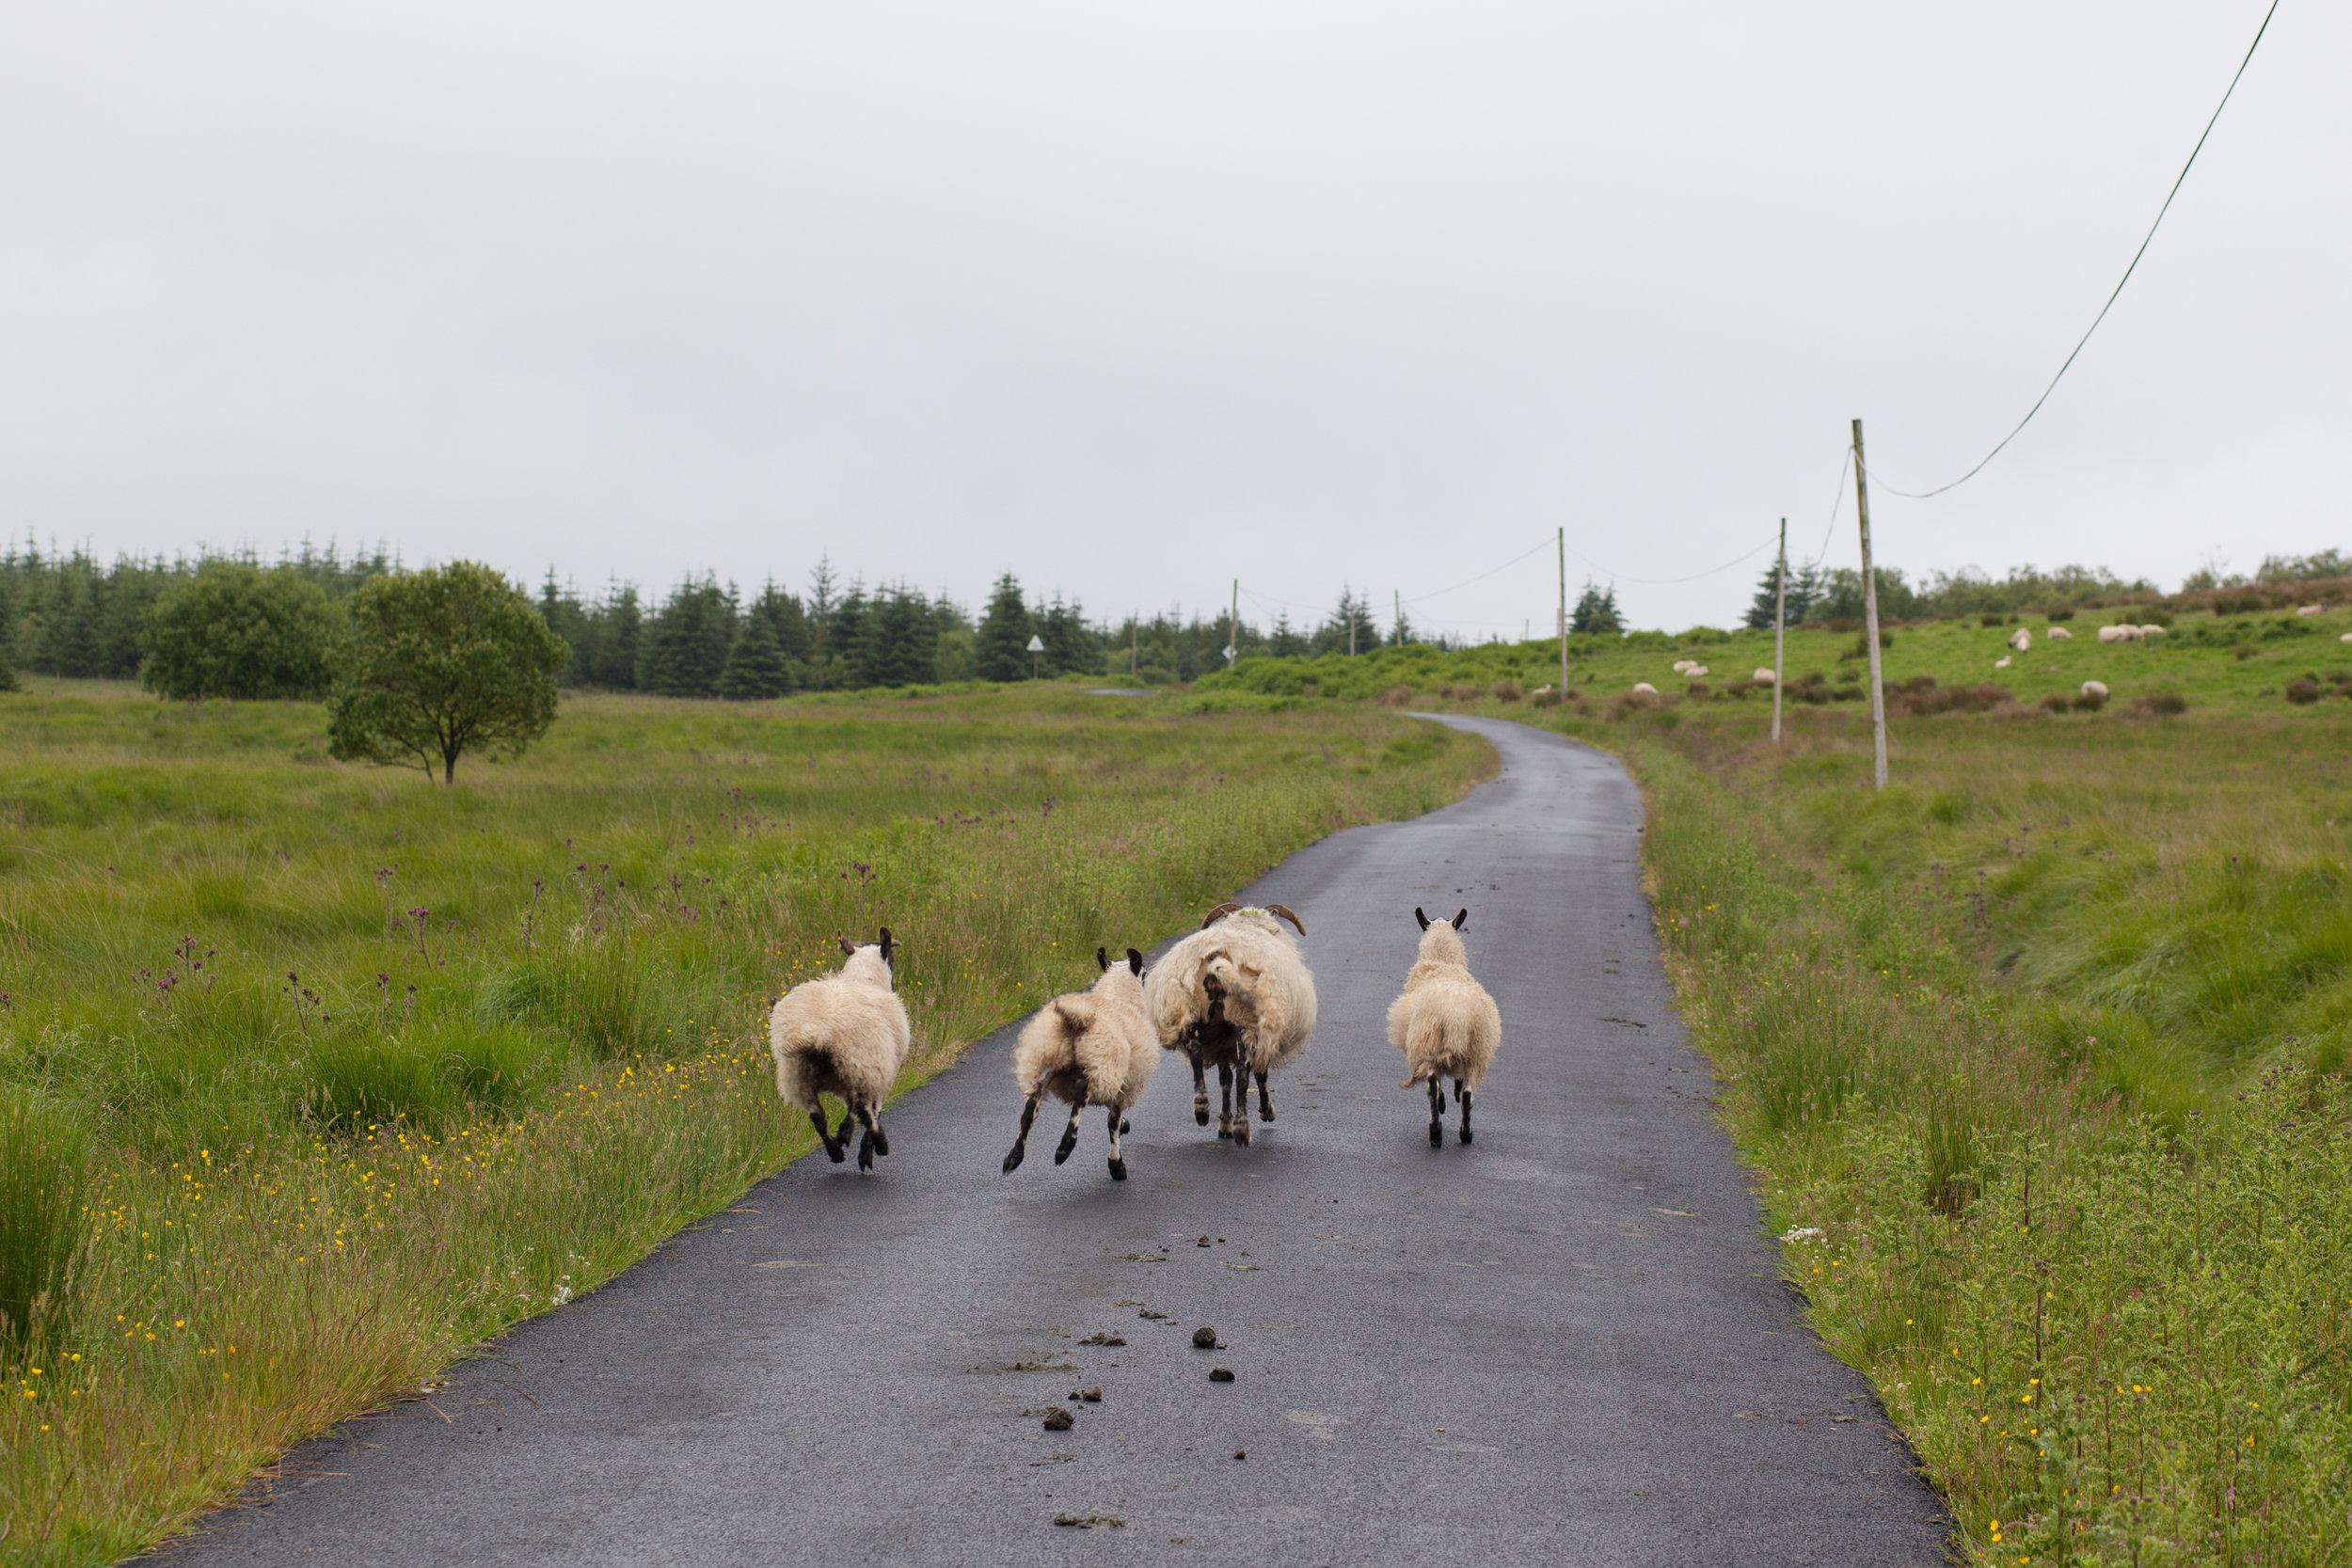 A family of sheep run along a road in Scotland.